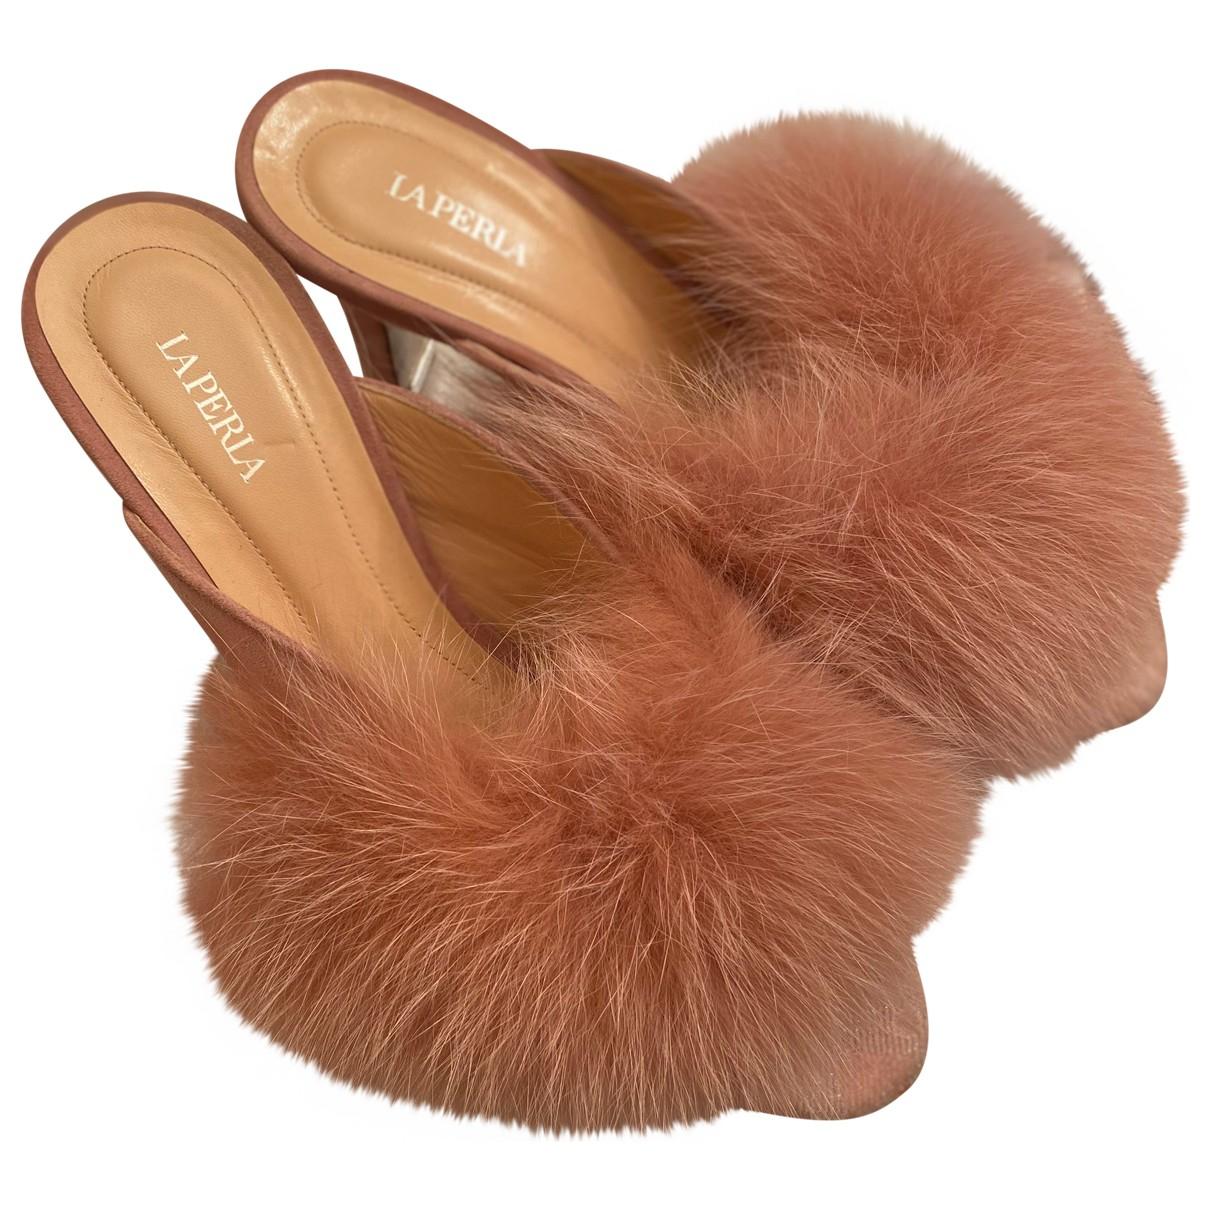 La Perla N Pink Fox Mules & Clogs for Women 38 EU